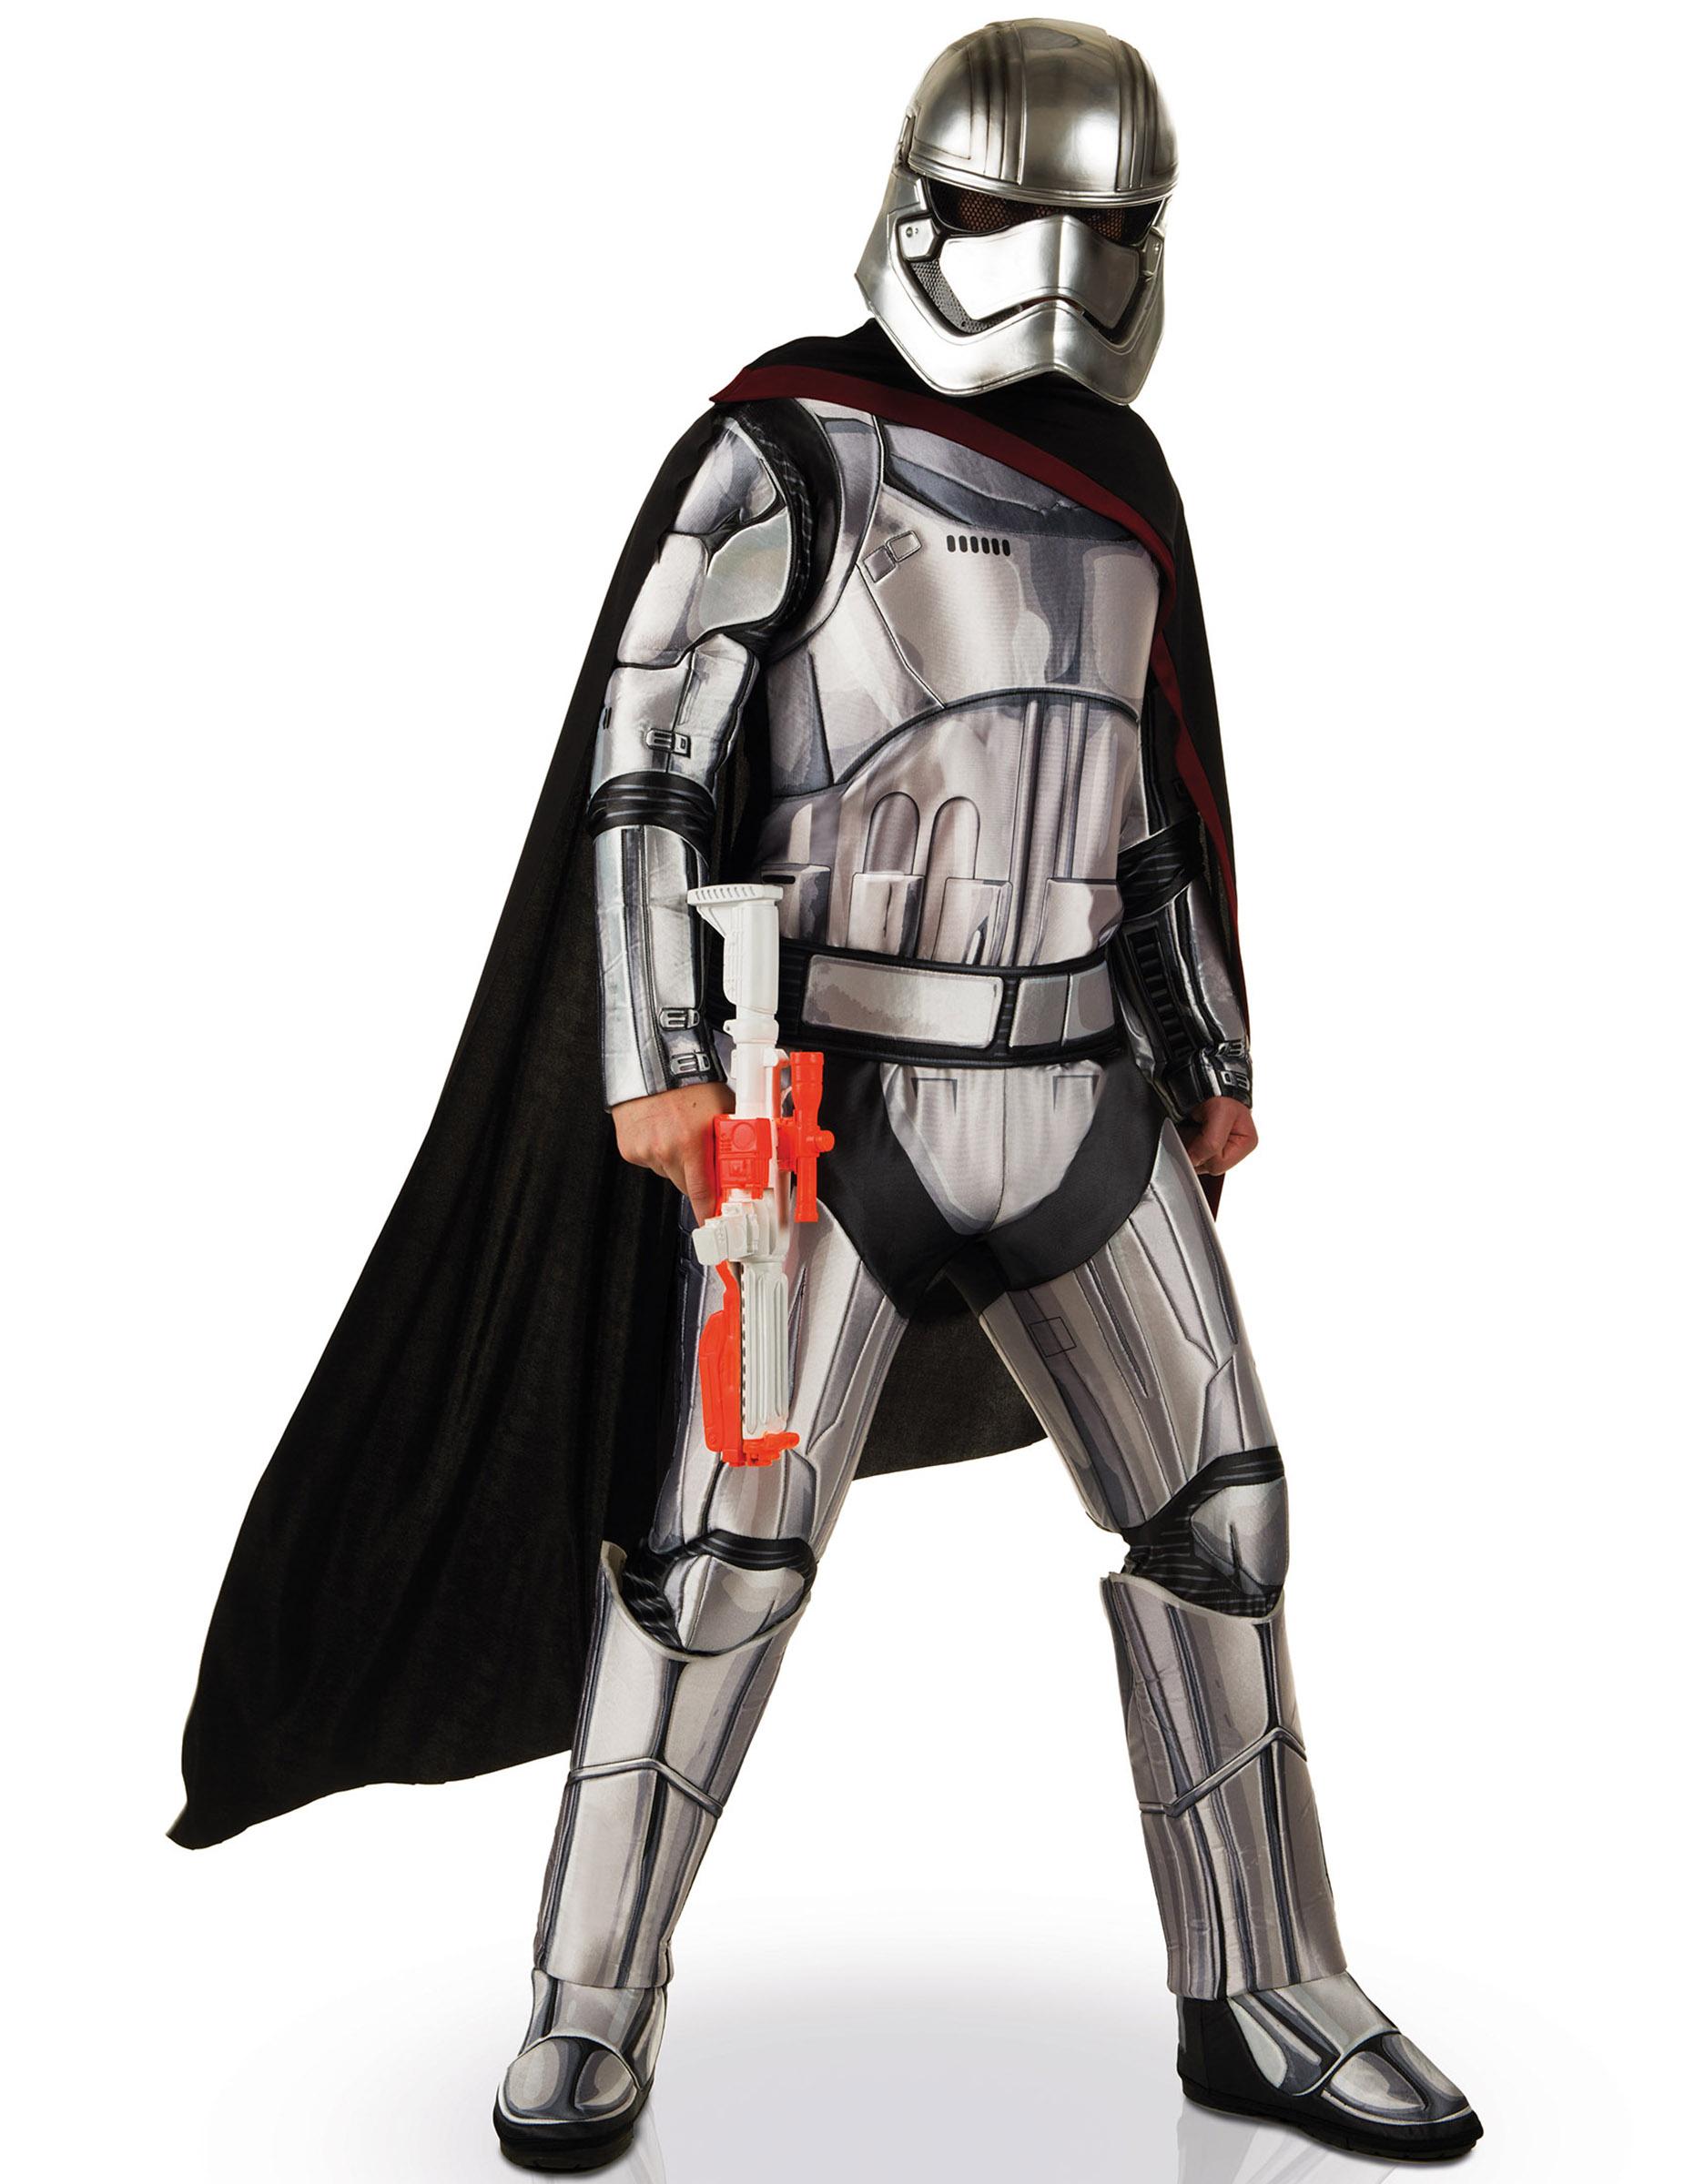 Deguisement-adulte-luxe-Captain-Phasma-Star-Wars-VII-Cod-232450